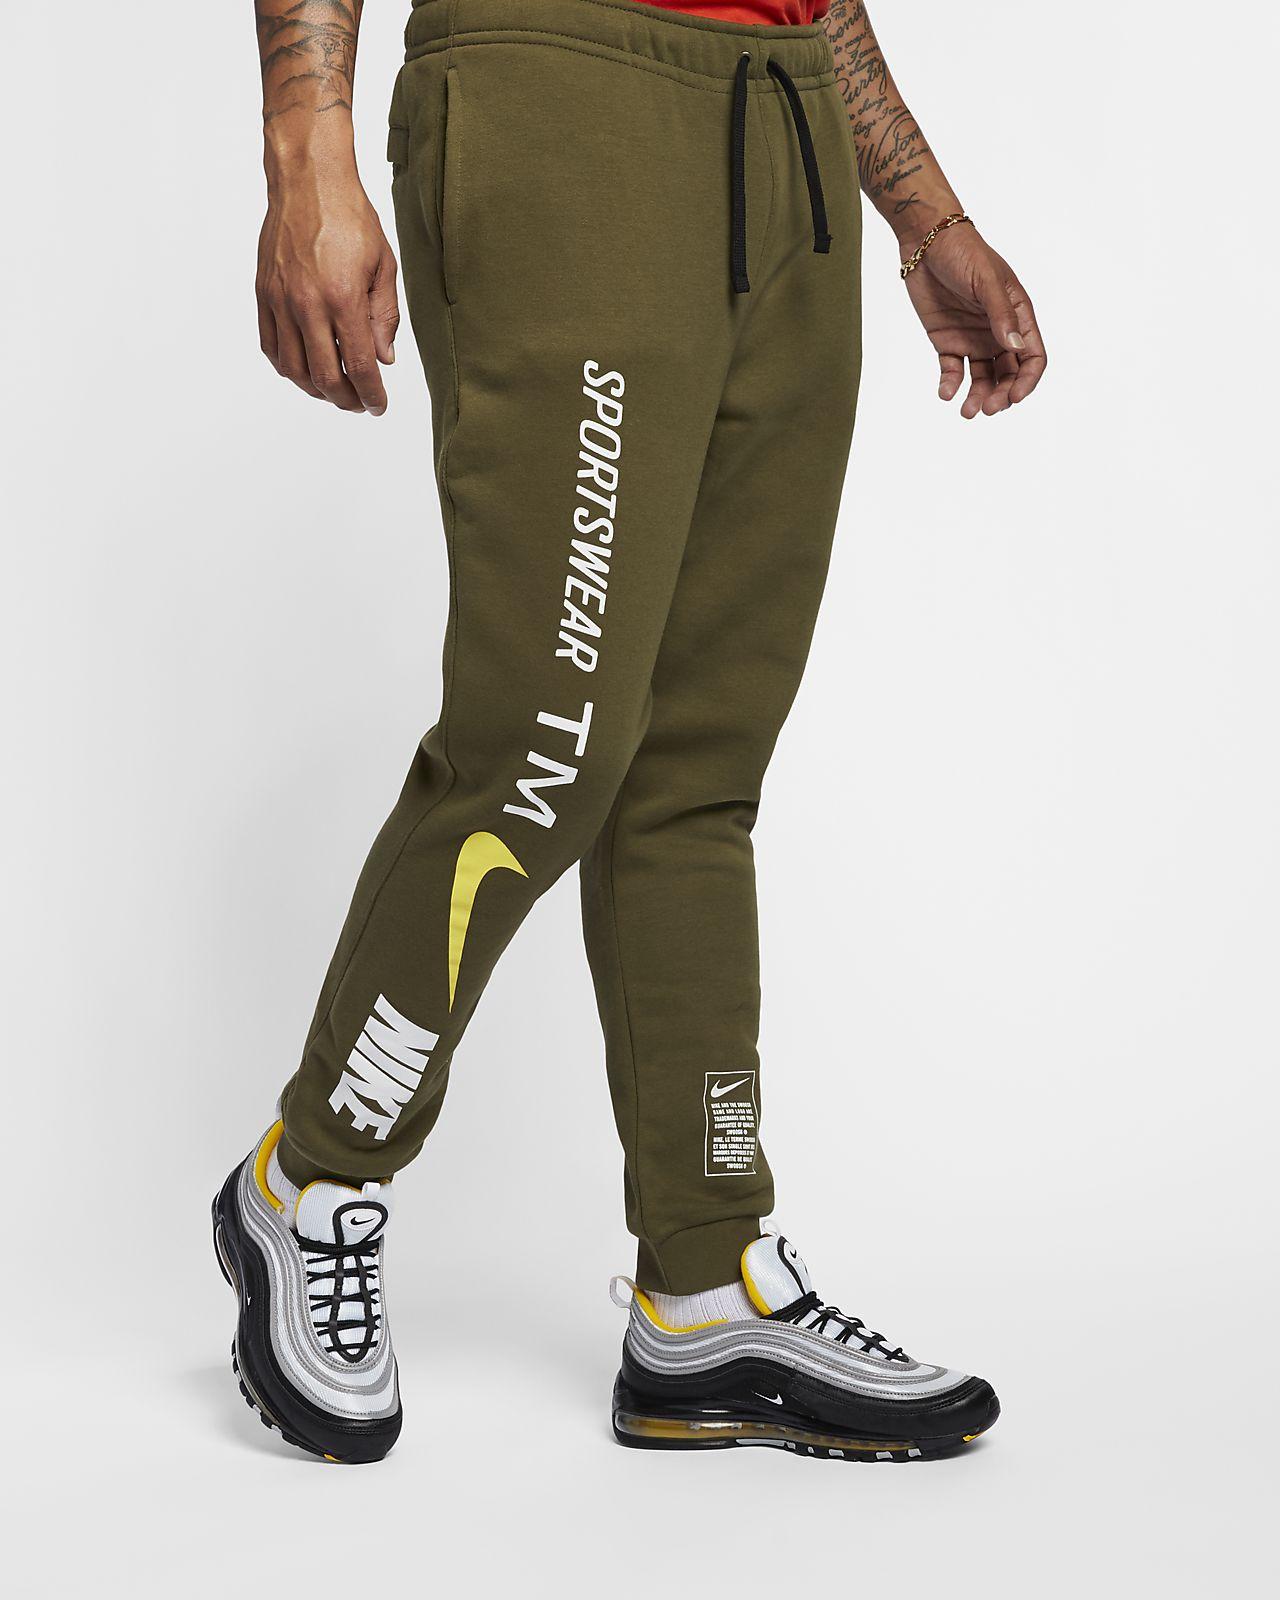 hot products sale exclusive range De Sportswear Pantalon Nike Jogging Club Ca ZqwWTdUxz